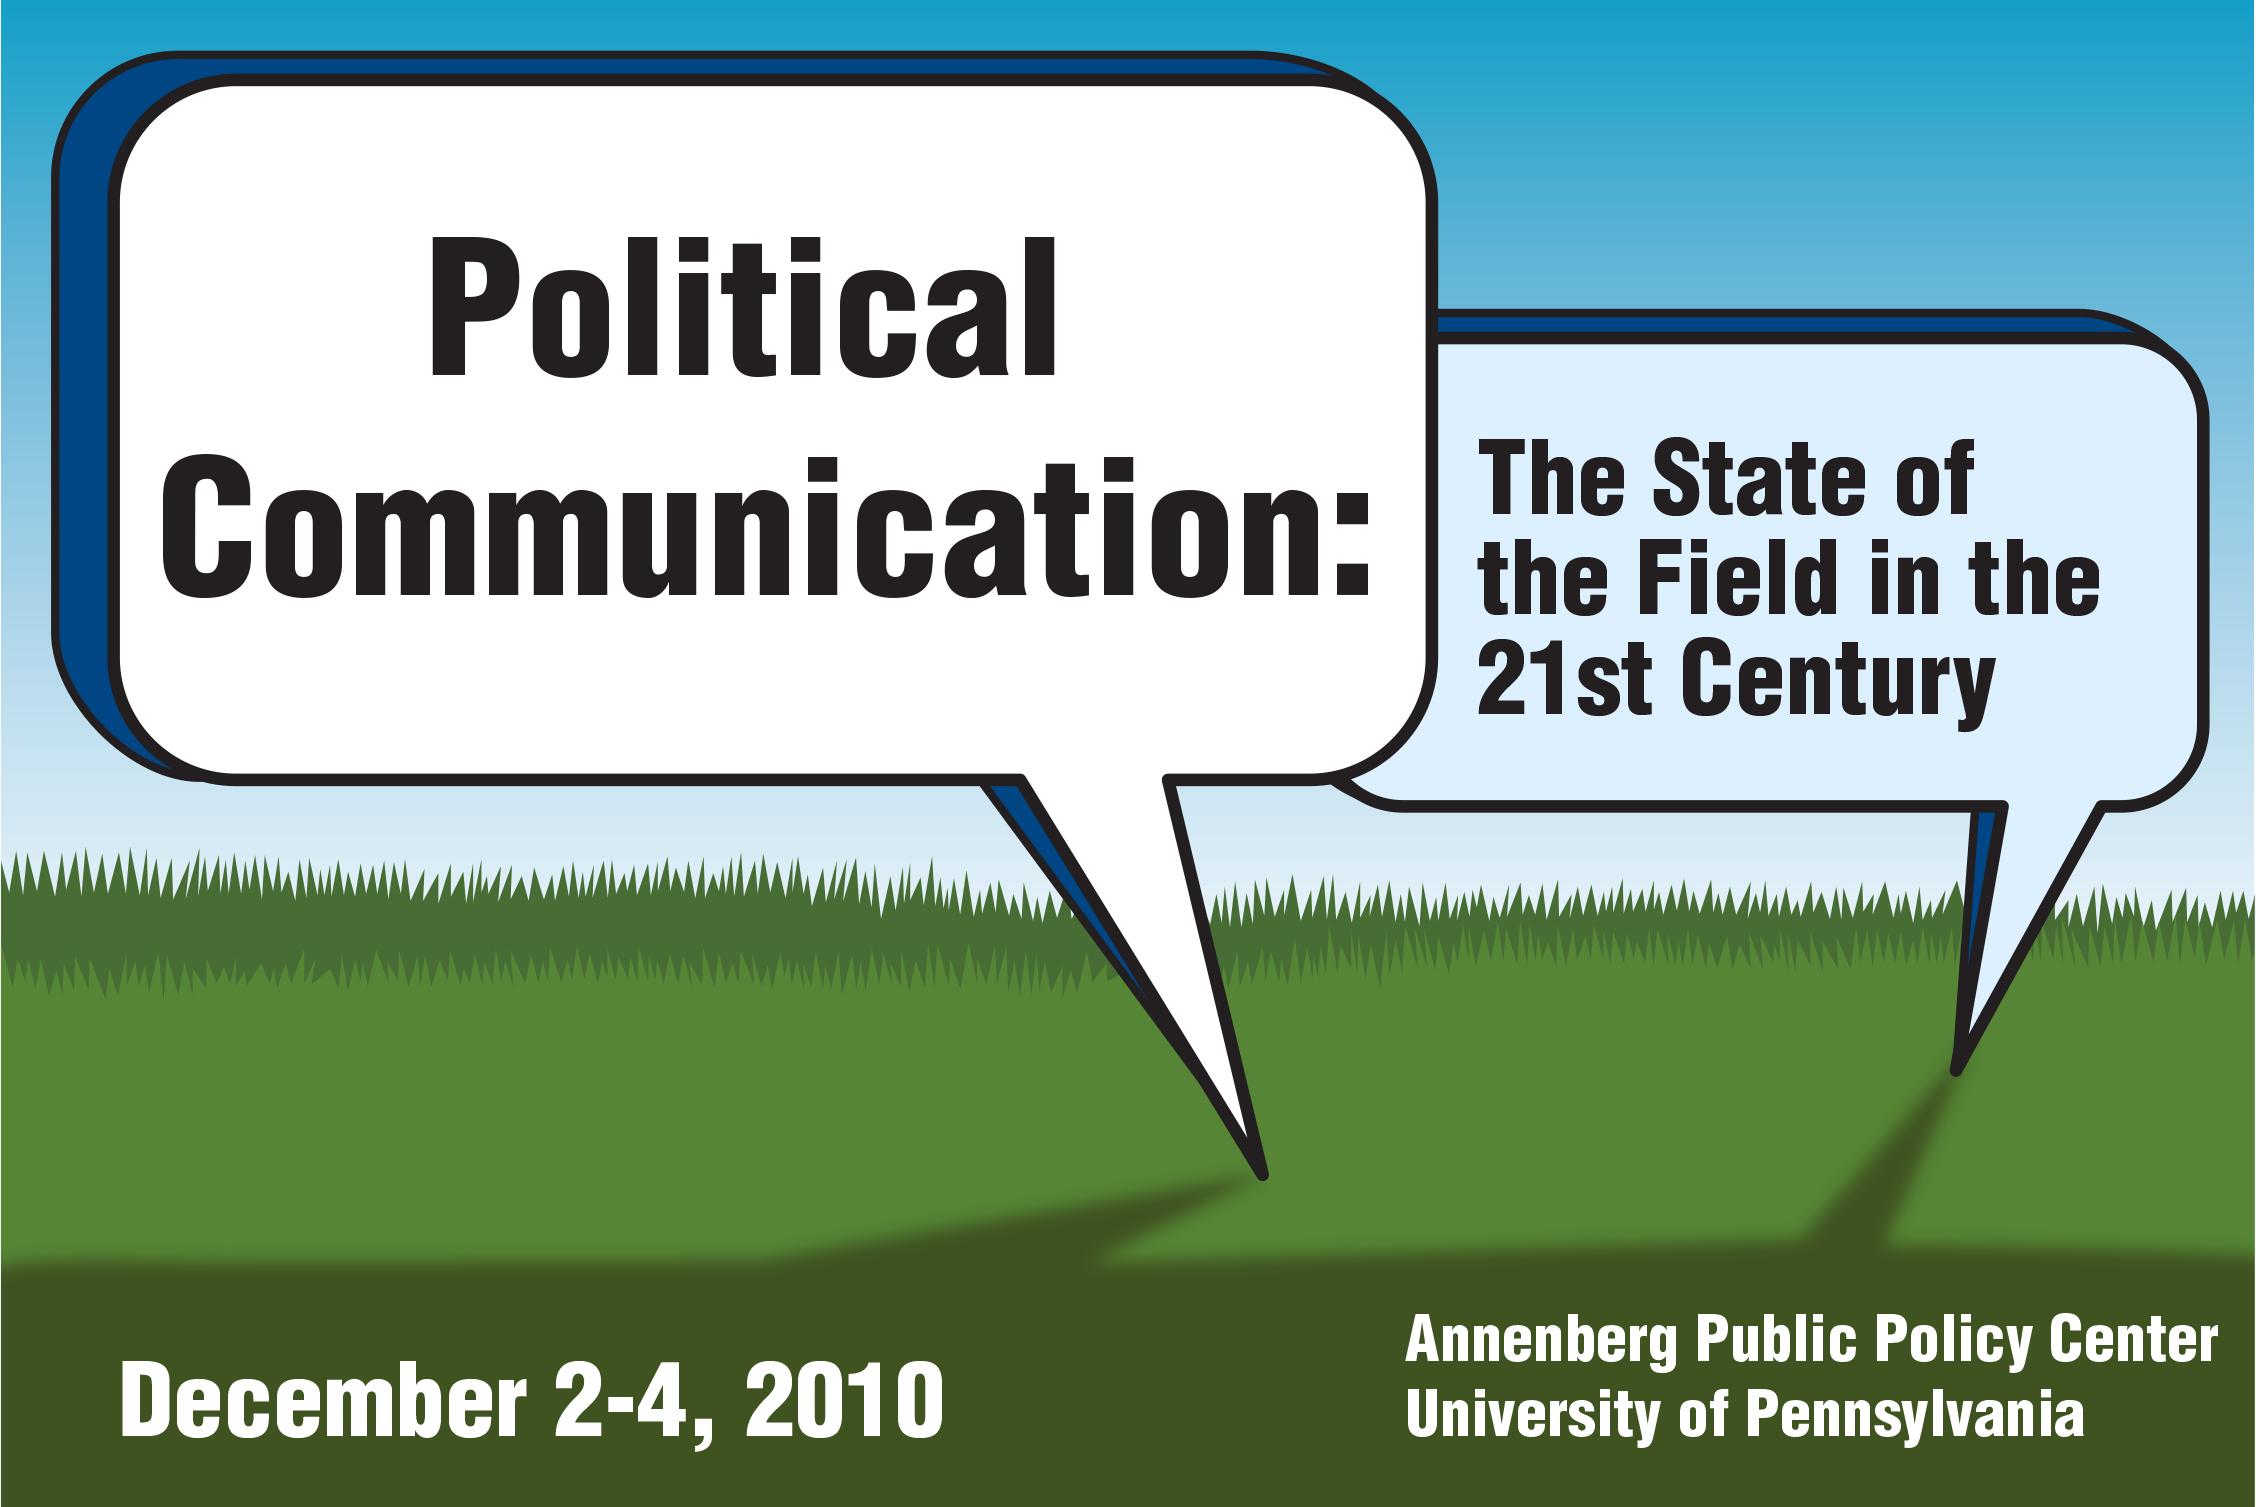 Conference logo, Annenberg Public Policy Center, University of Pennsylvania